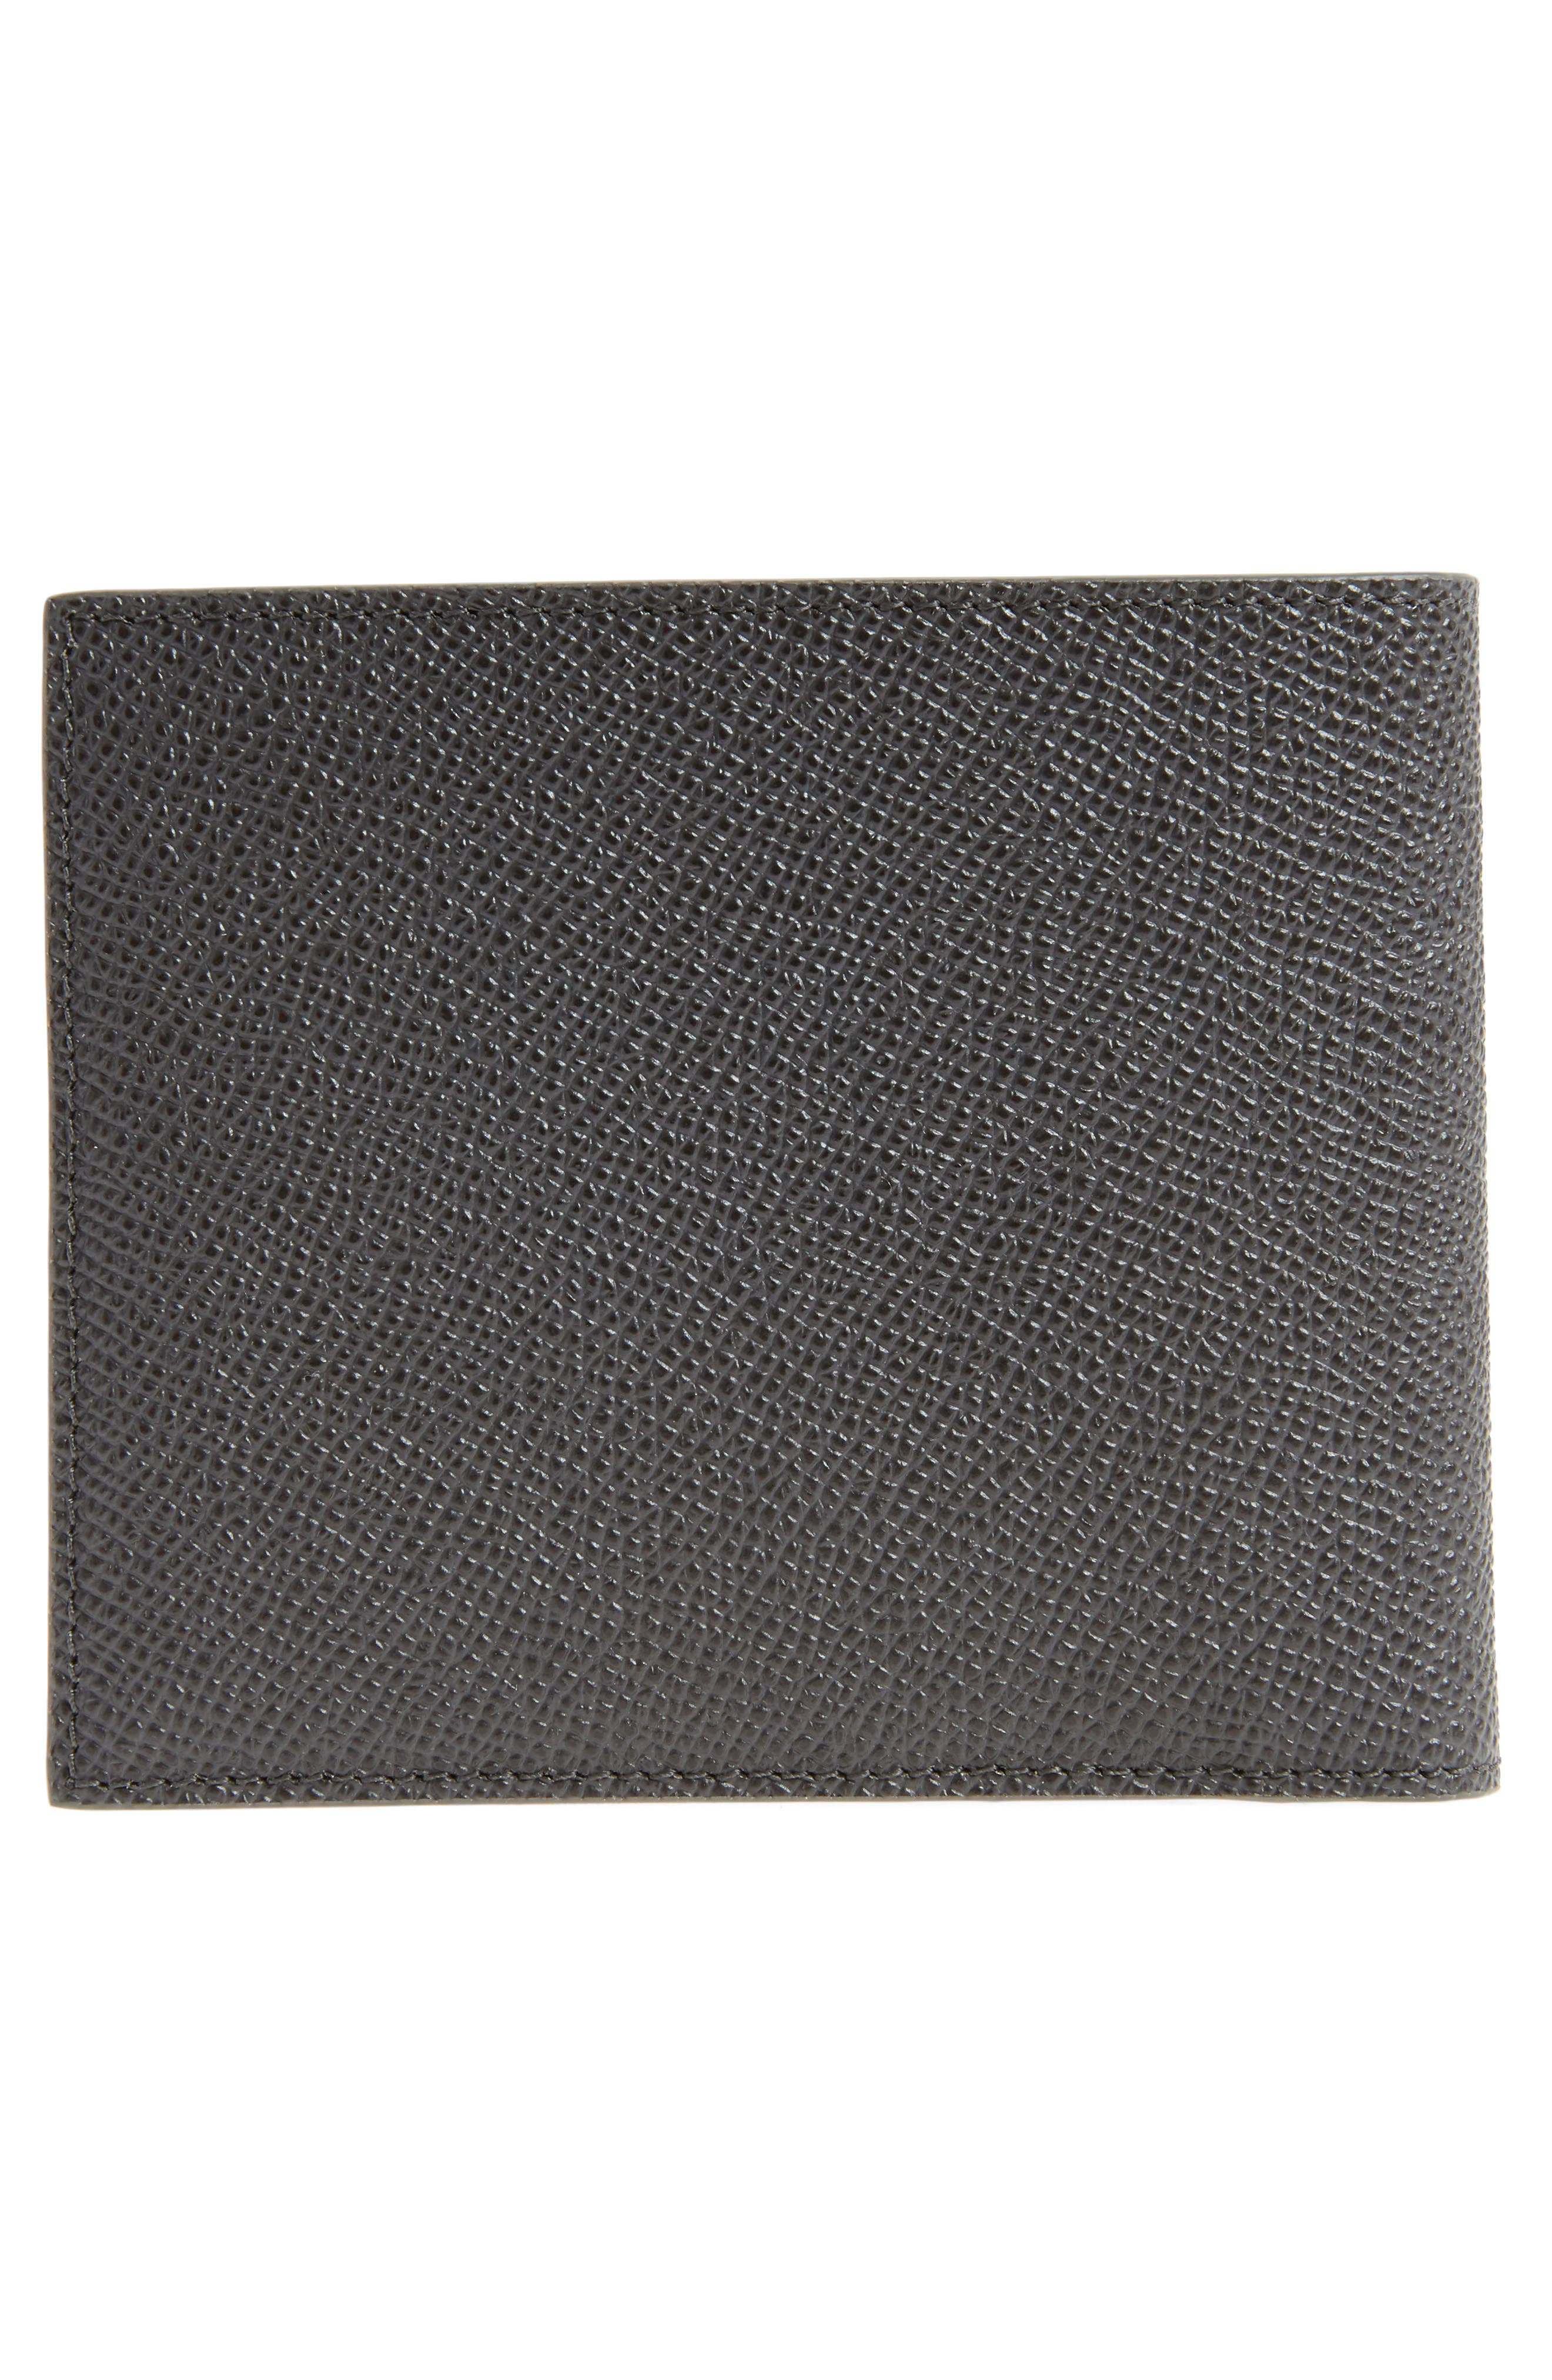 Alternate Image 3  - Givenchy Calfskin Leather Bifold Wallet